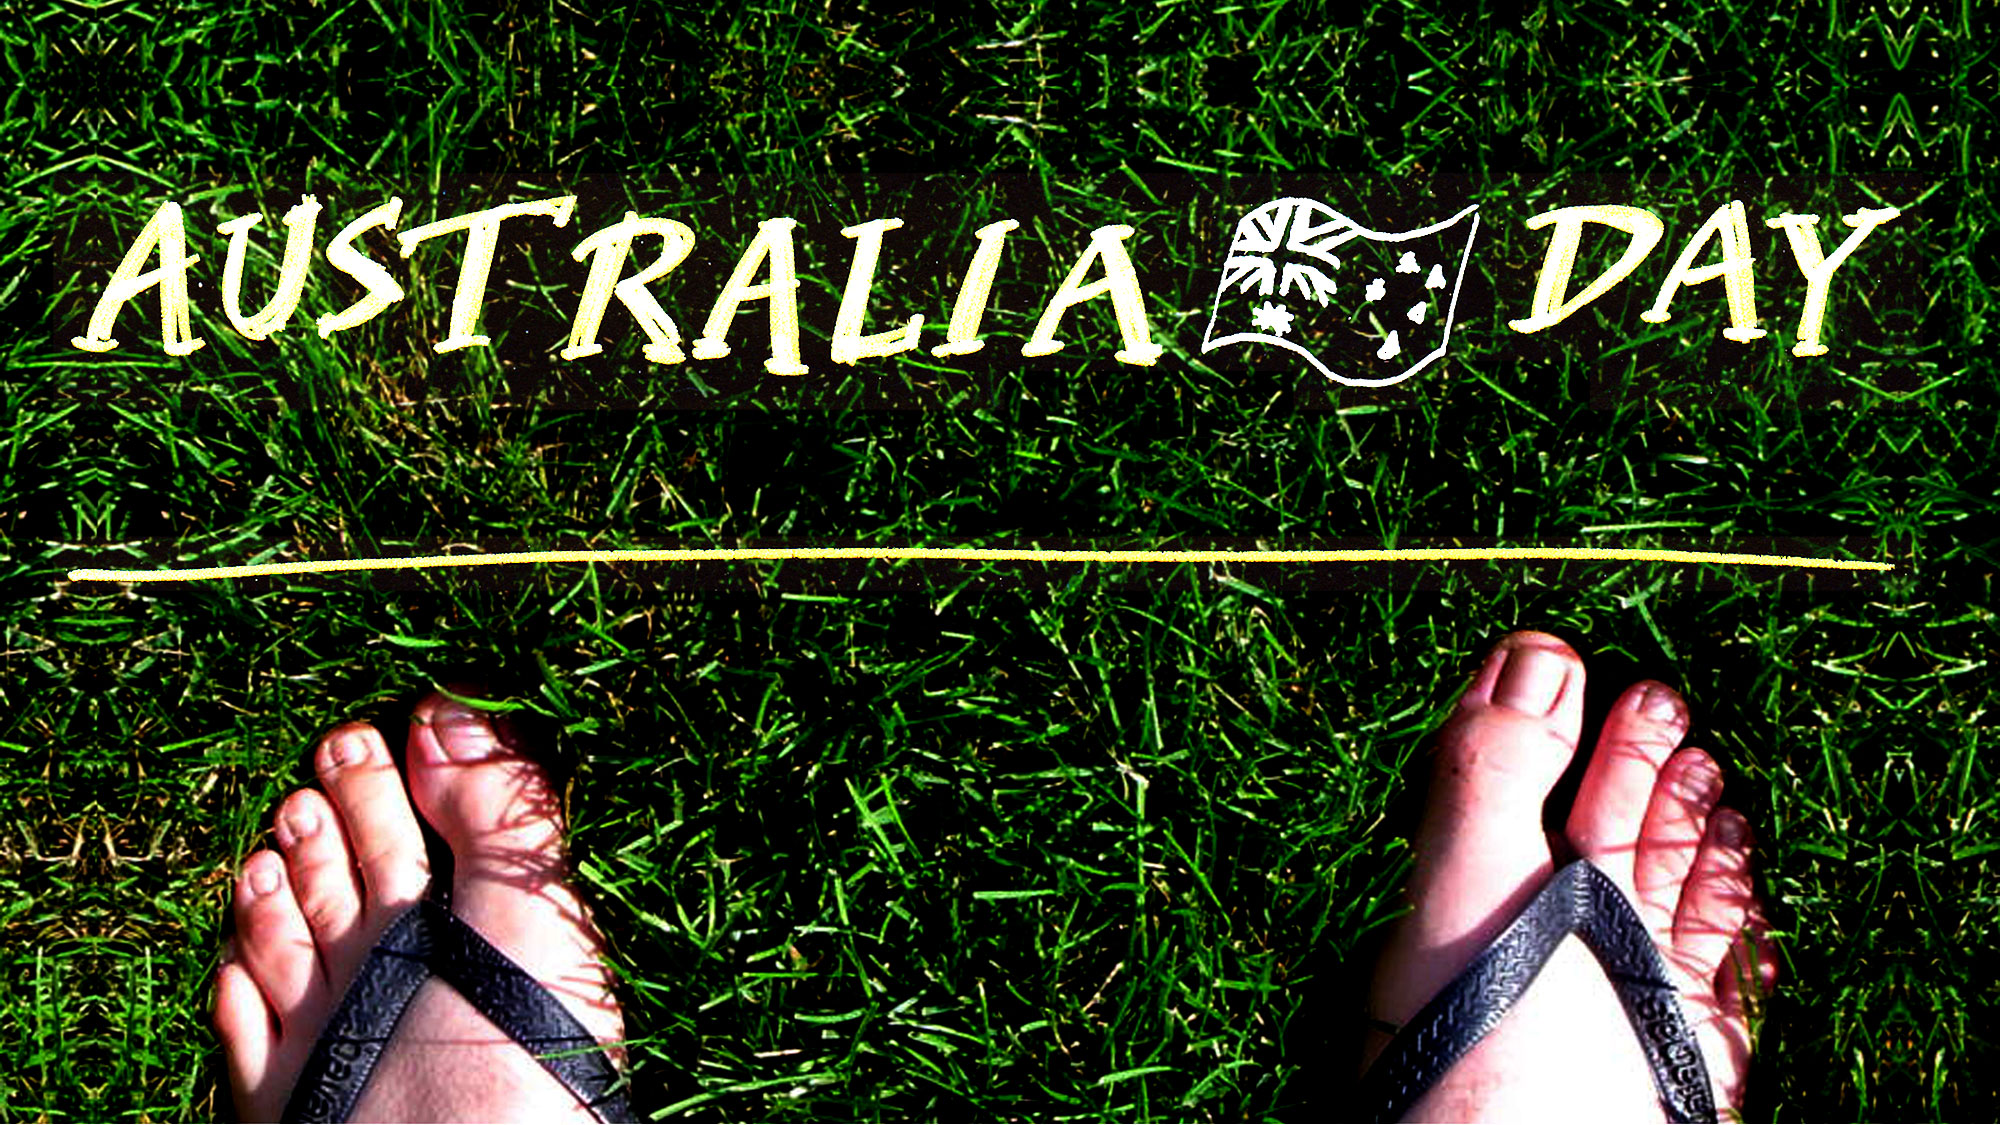 Print / Web: Australia Day